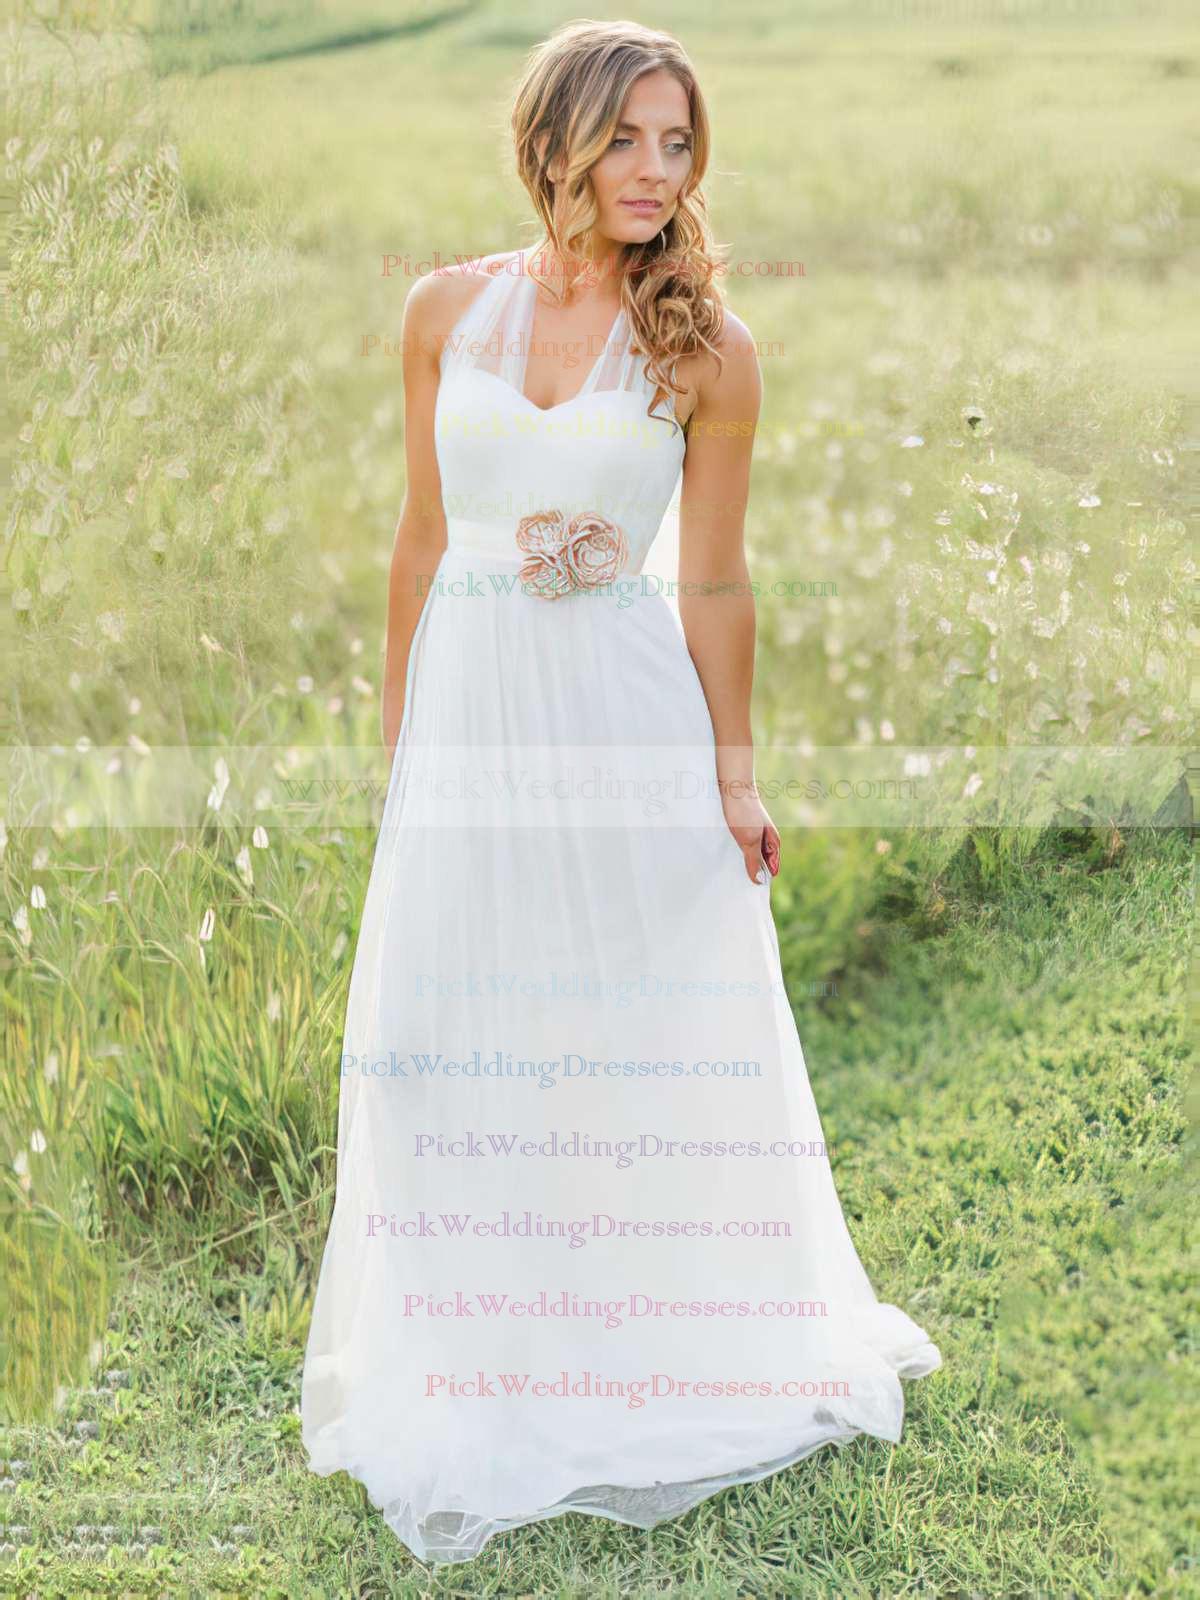 http://www.pickweddingdresses.com/elegant-halter-white-tulle-a-line-sashes-ribbons-sweep-train-amazing-wedding-dress-pwd00021270-p1149.html?utm_source=post&utm_medium=PWD007&utm_campaign=blog